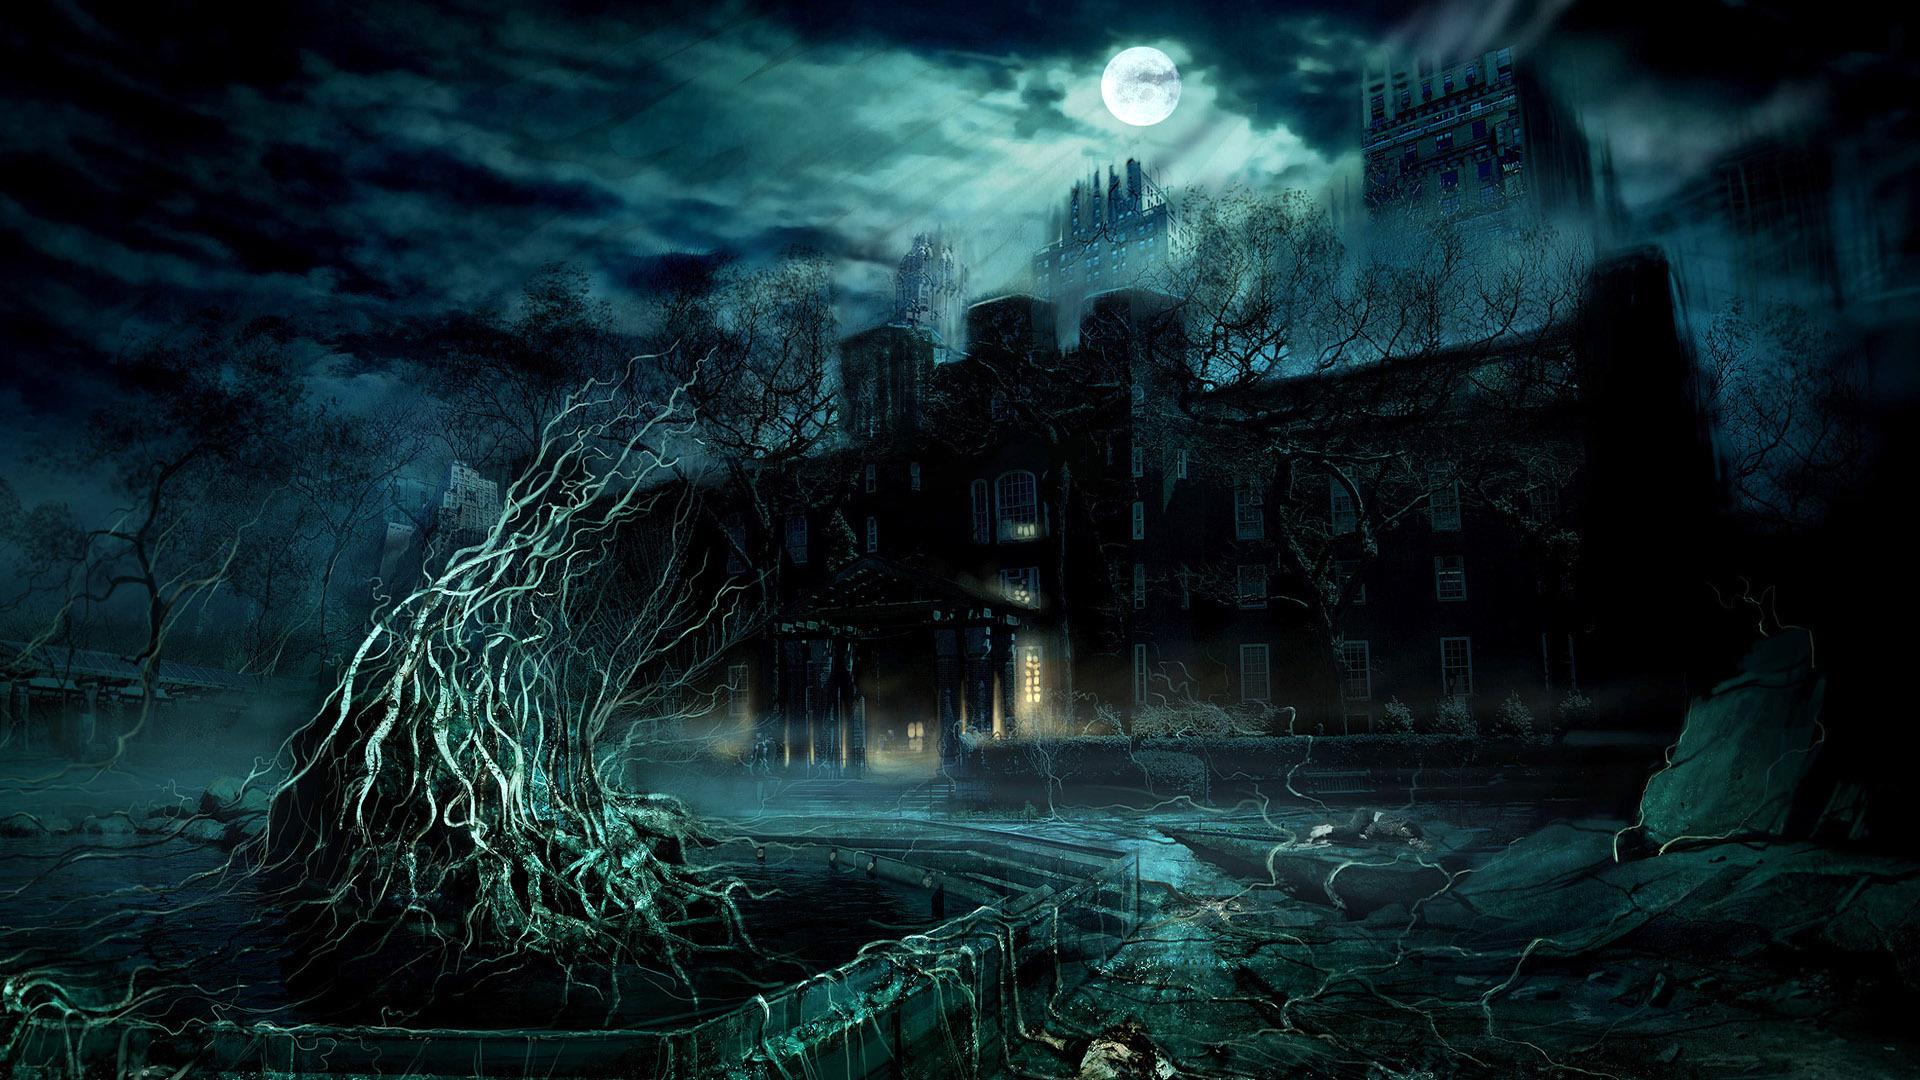 Horror Wallpapers Hd Free Download: Horror Wallpaper HD